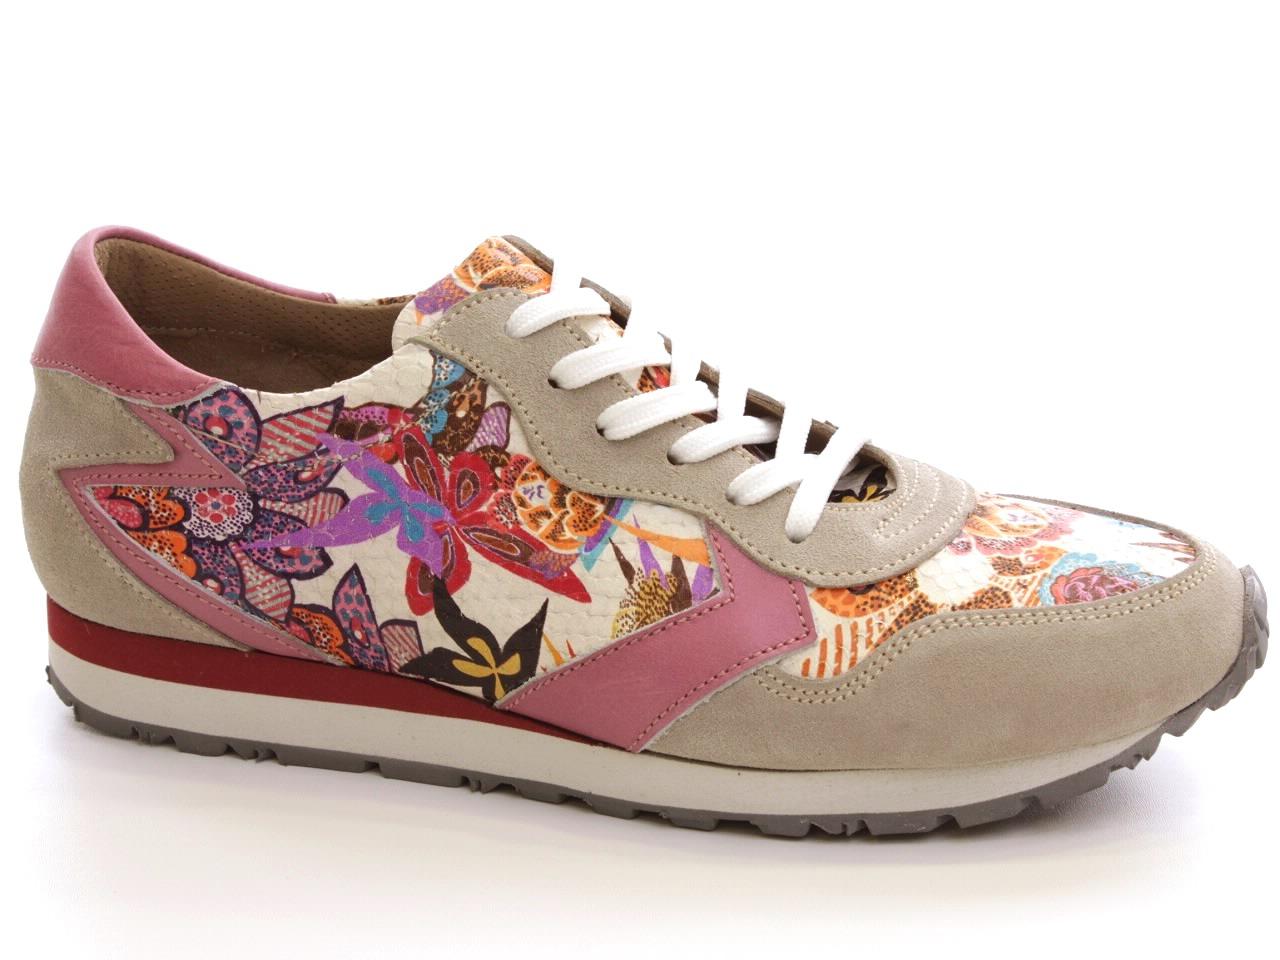 Sneakers and Espadrilles Cohibas - 182 CS0209